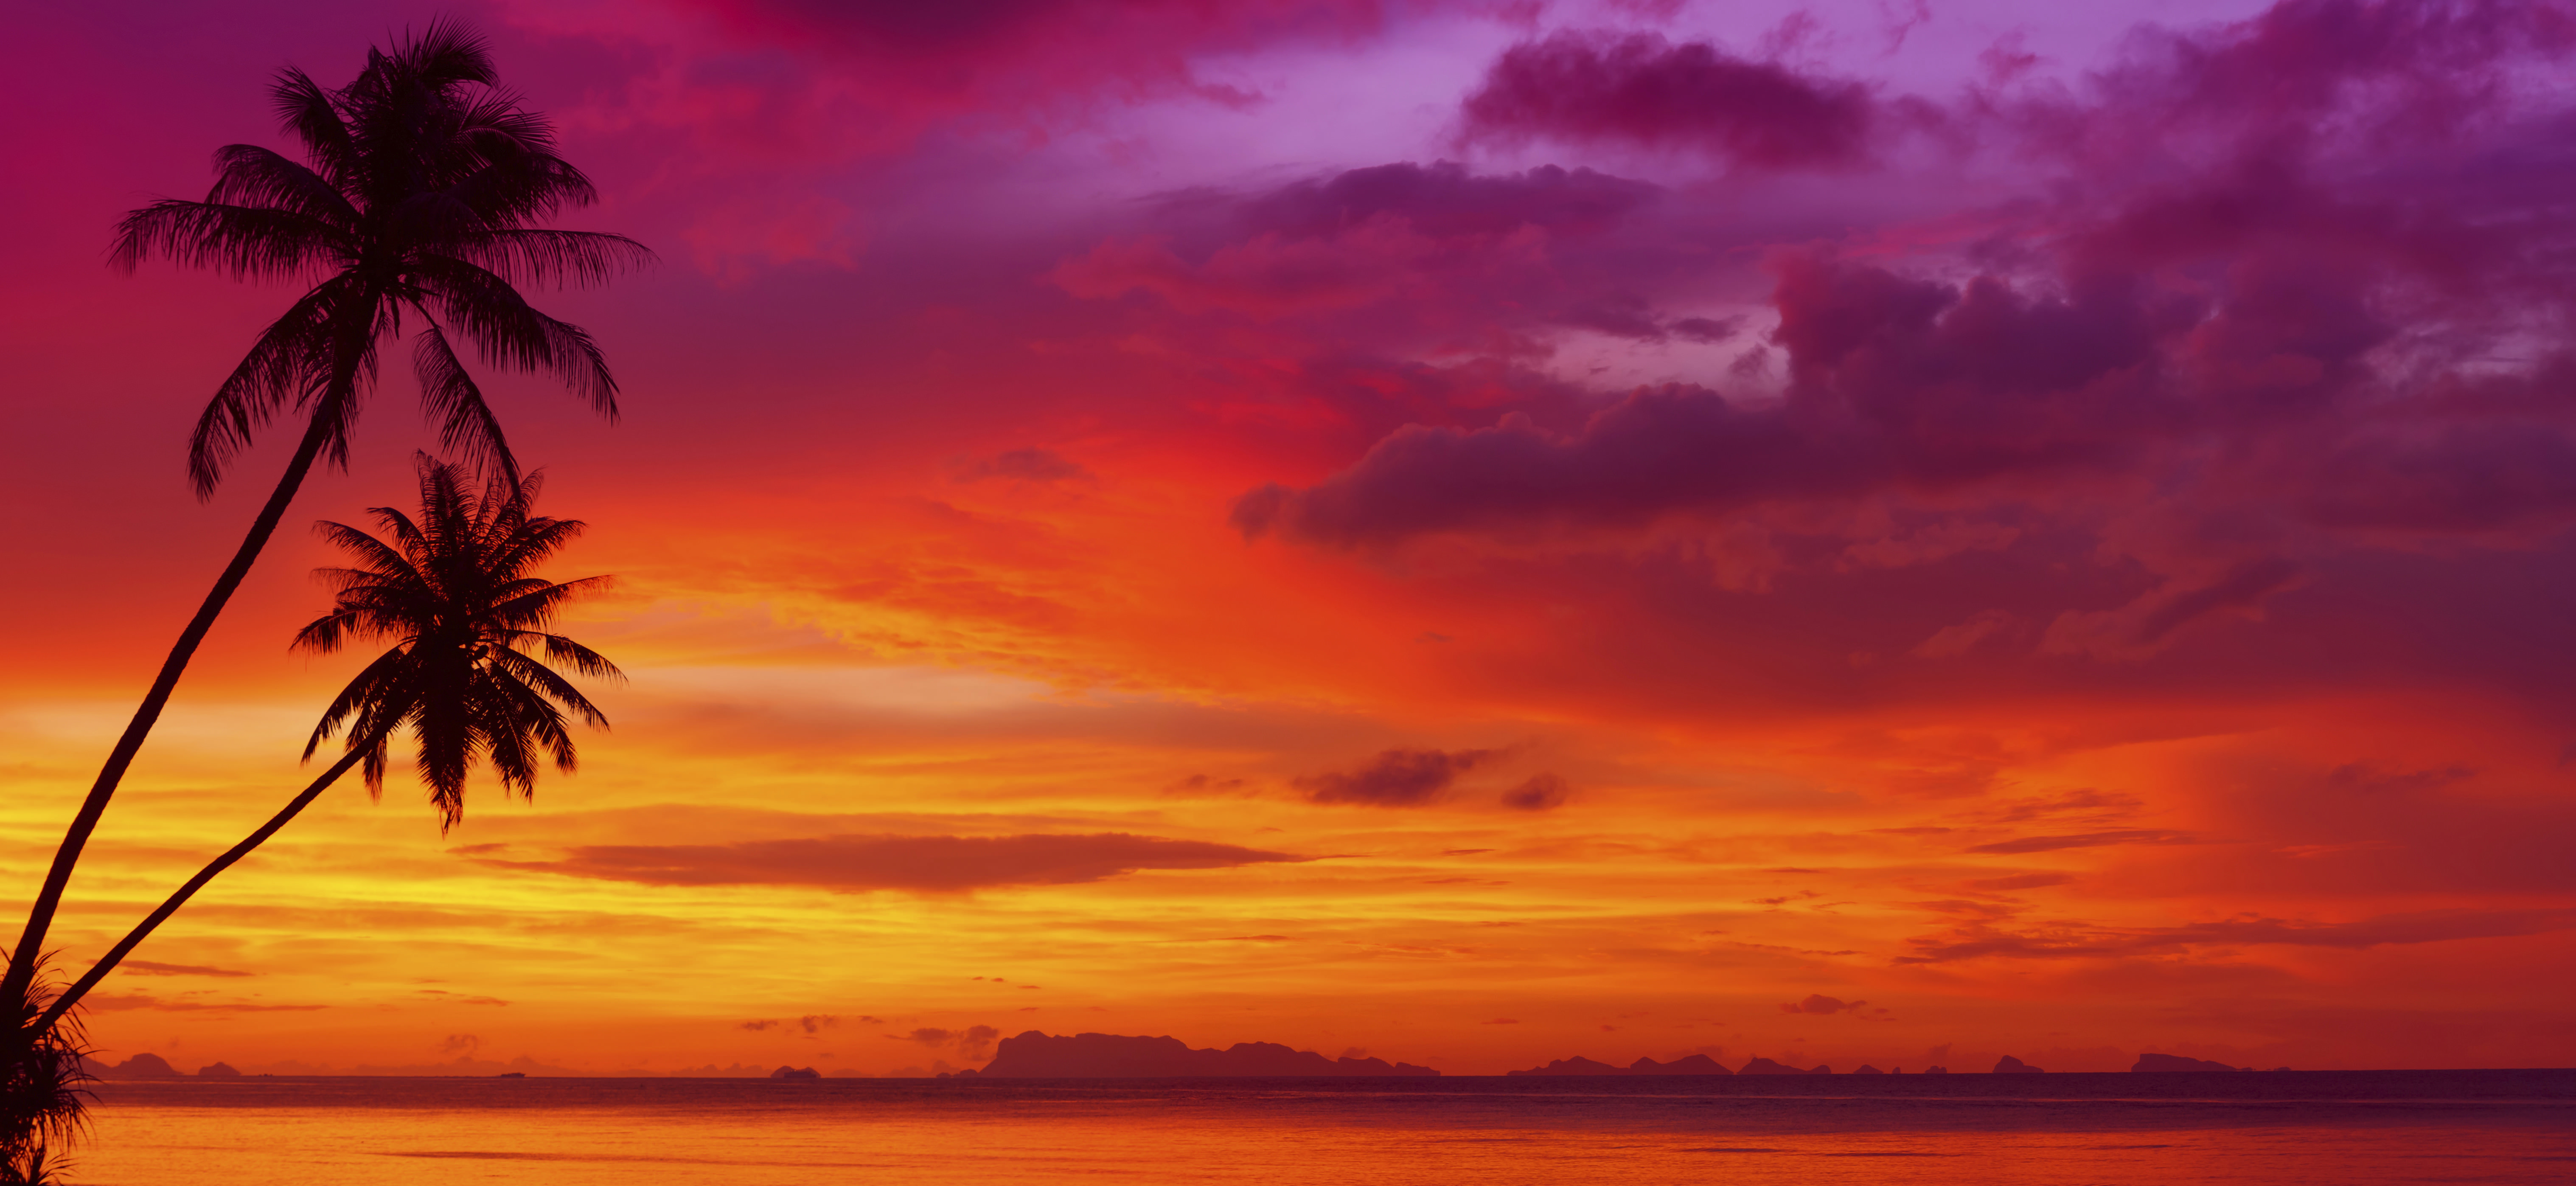 Sunset With Tropical Palm Trees – Designer Splashback - Cameo Glass